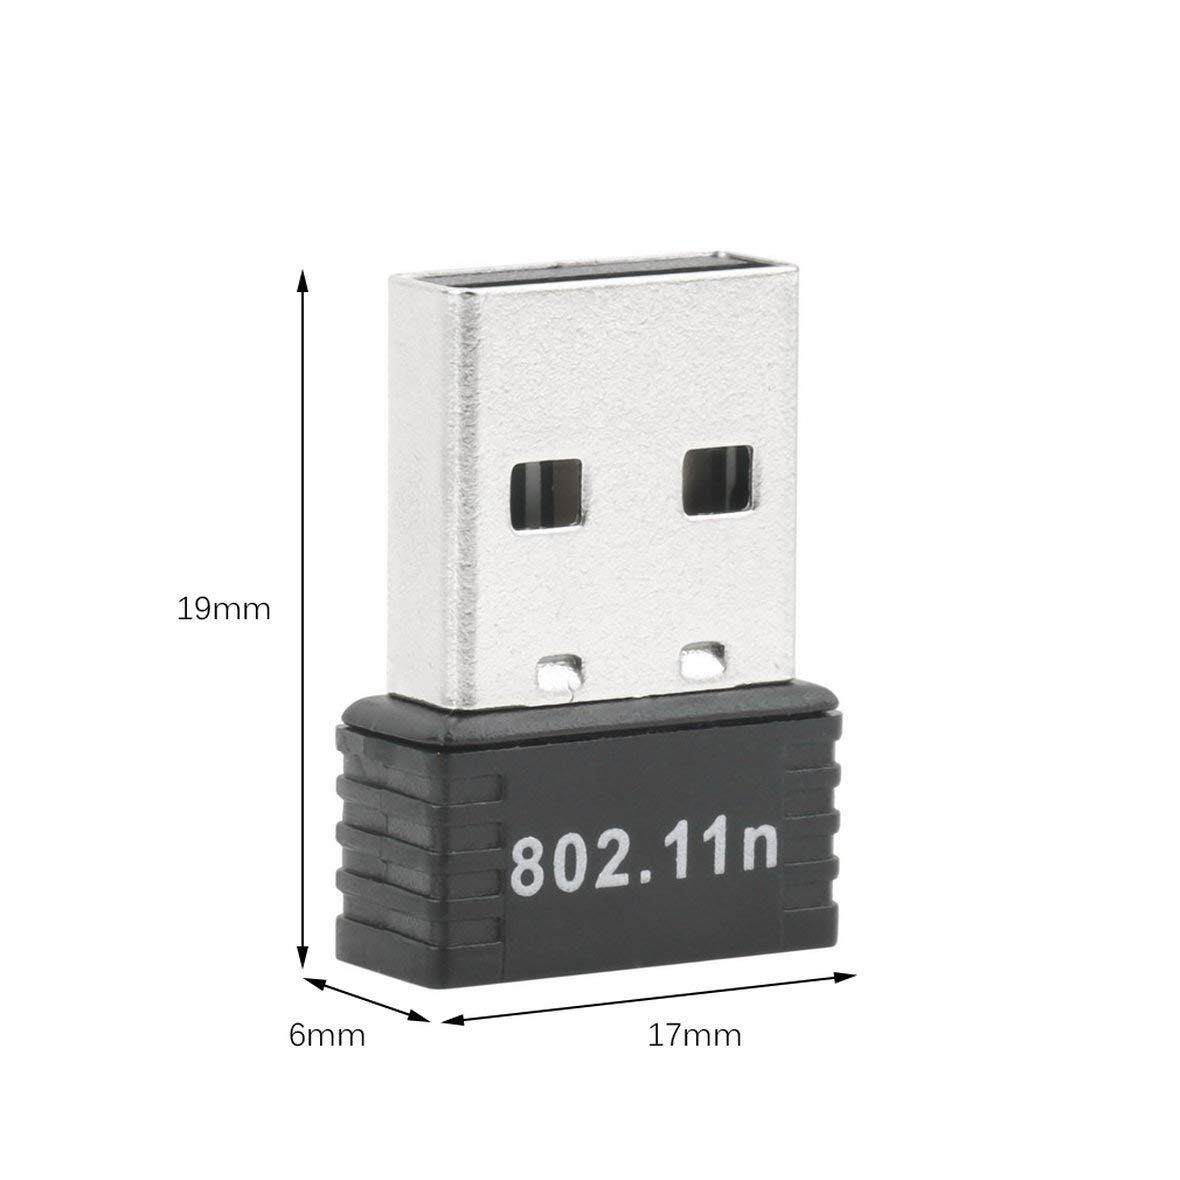 Tivolii WiFi Wireless Adapter 150Mbps 150M Mini USB WiFi Wireless Adapter Network LAN Card 802.11n/g/b STBC Support Extended Range